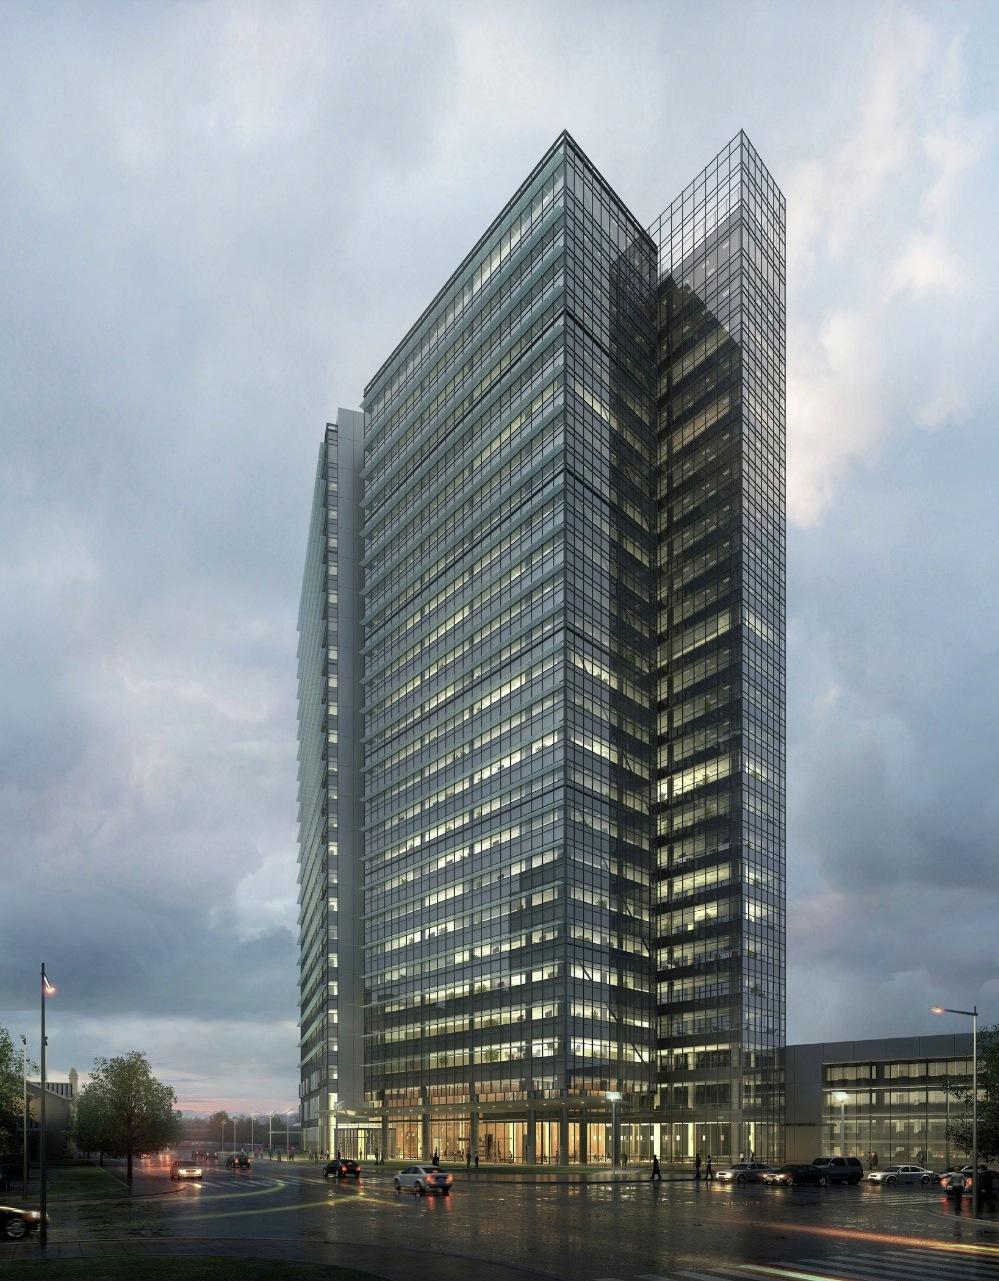 Rmjm design vista center leed platinum office building for Leed building design